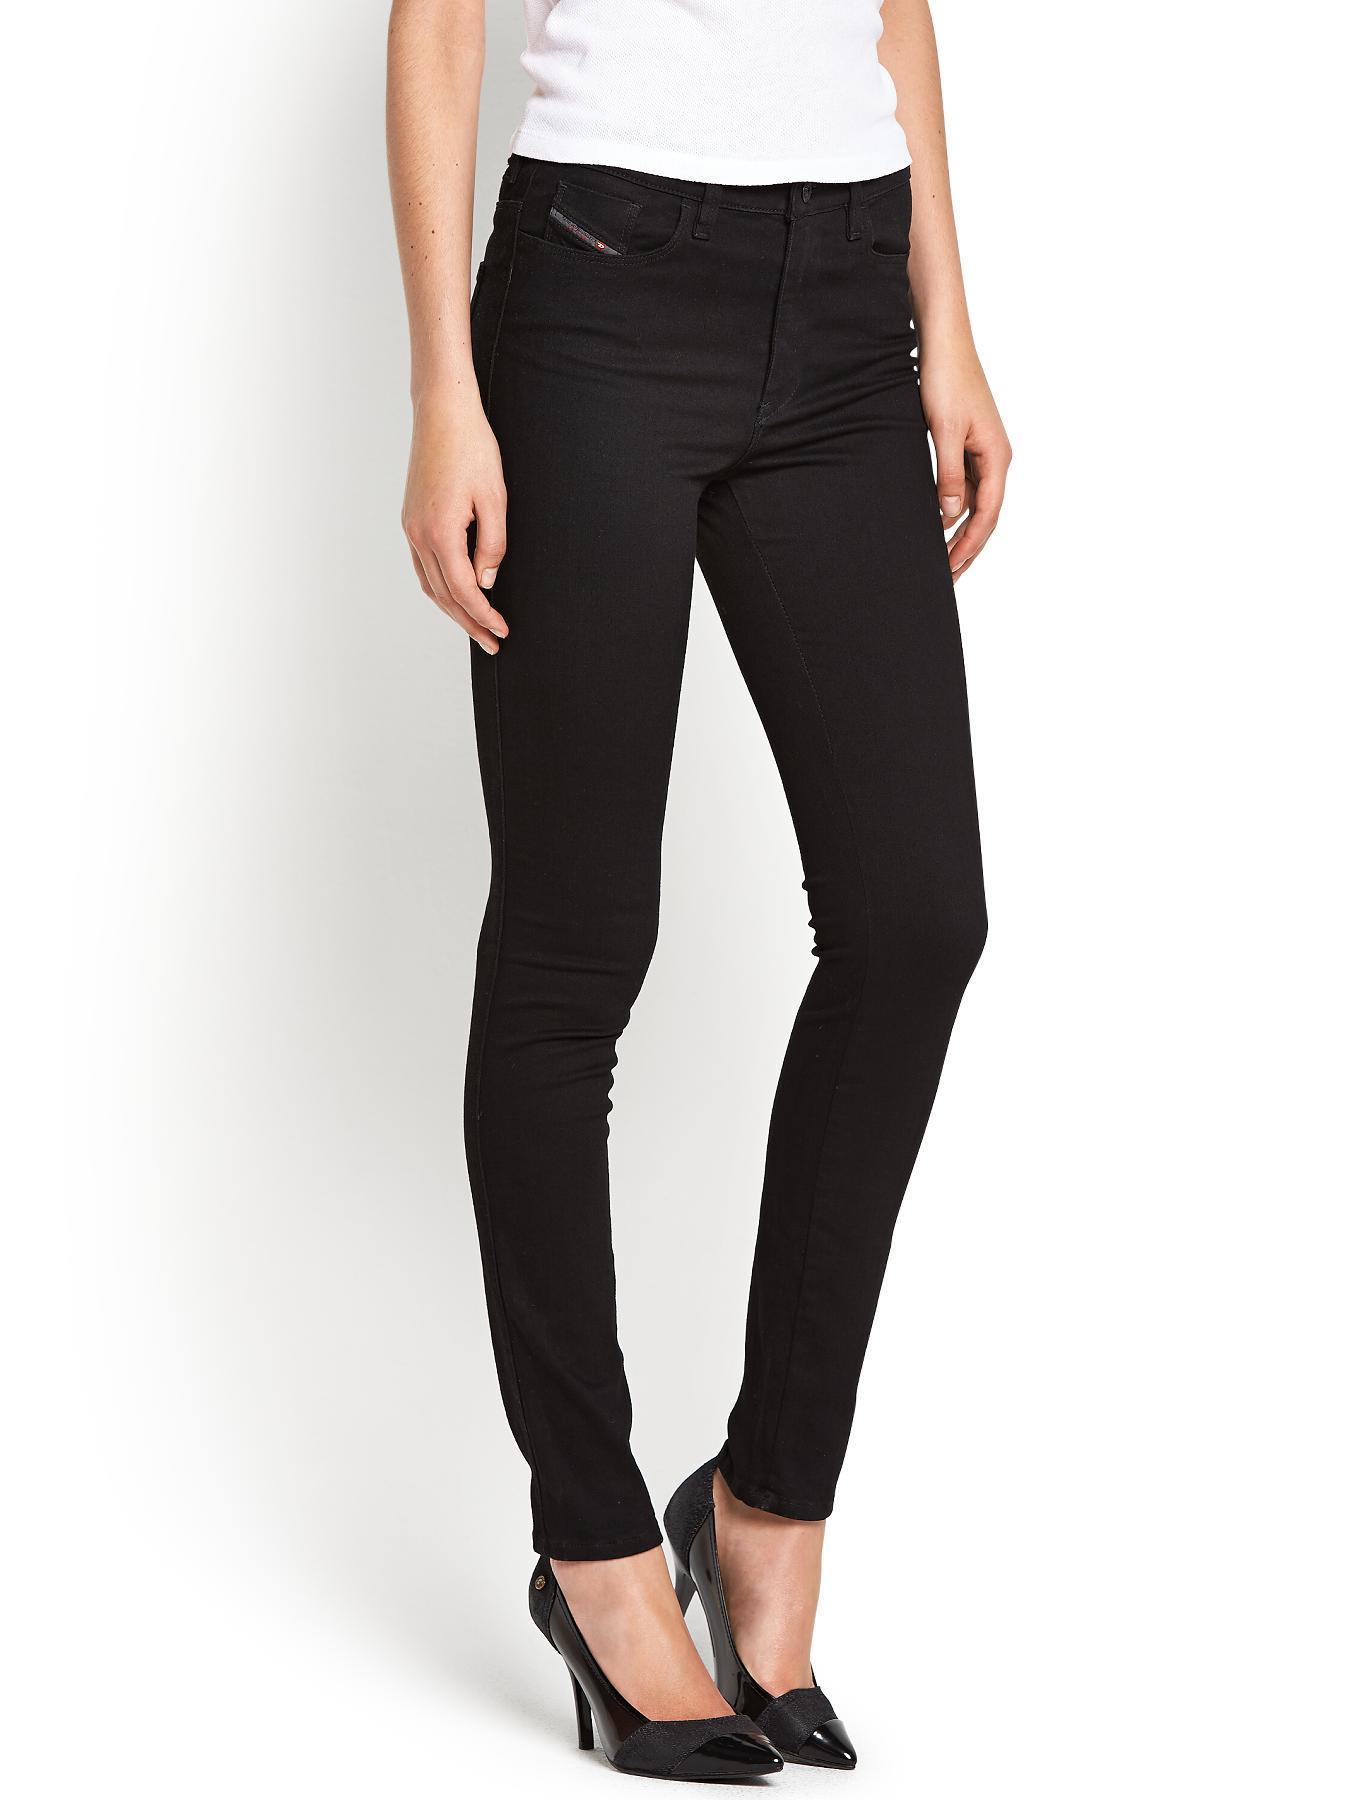 Skinzee High Skinny Jeans - Black, Black